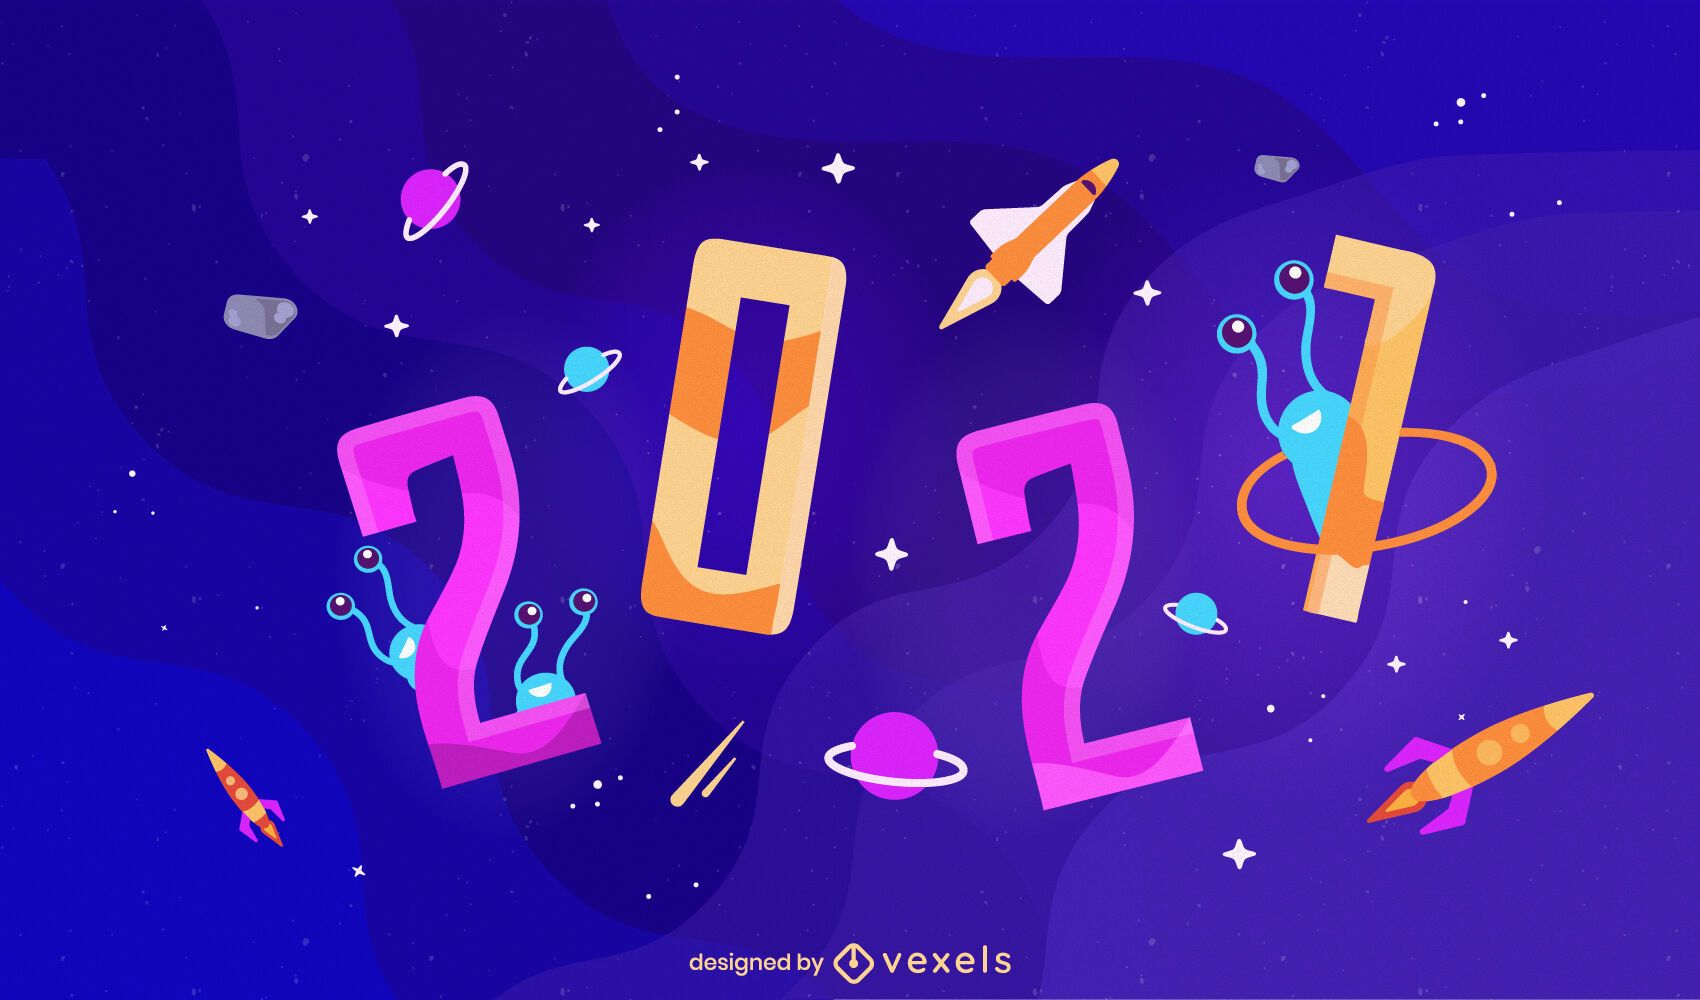 2021 space illustration design